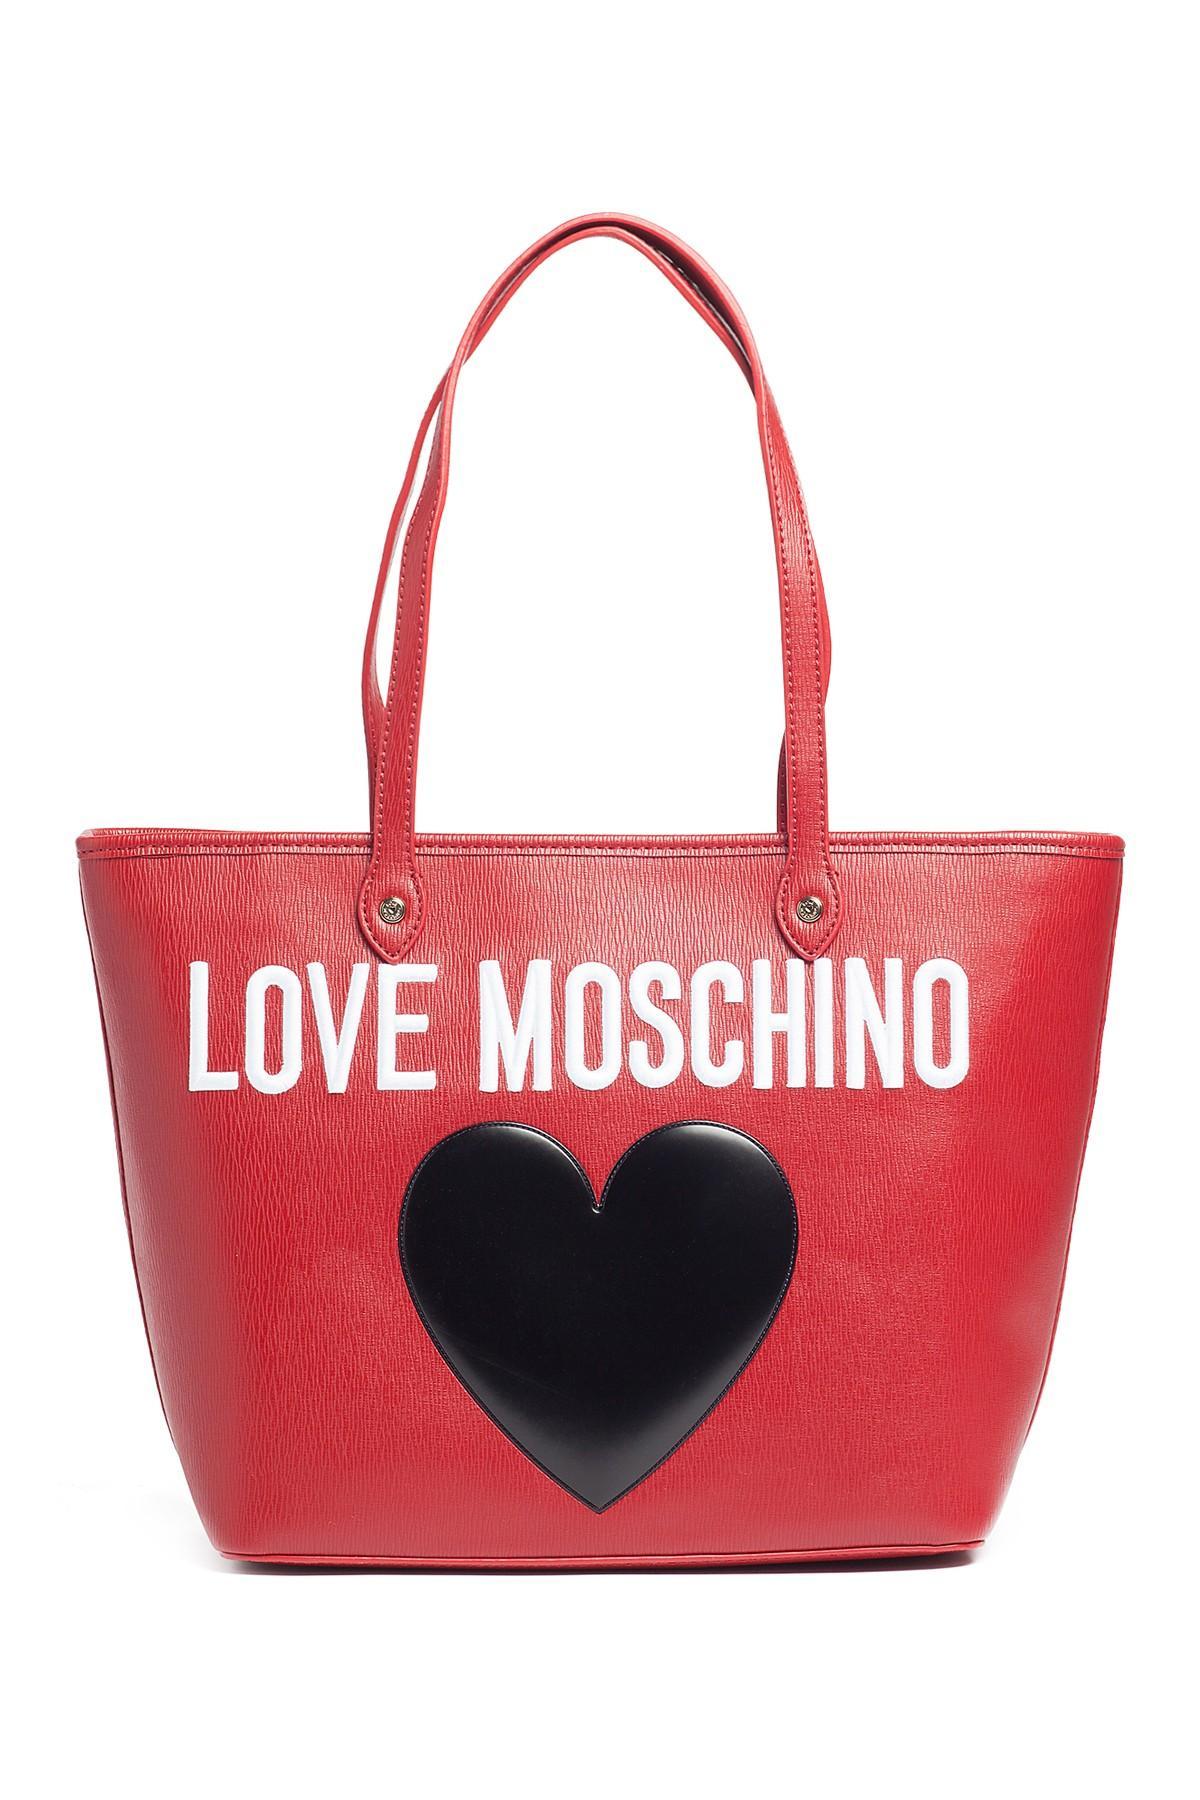 Lyst Love Moschino Saffiano Heart Tote In Red